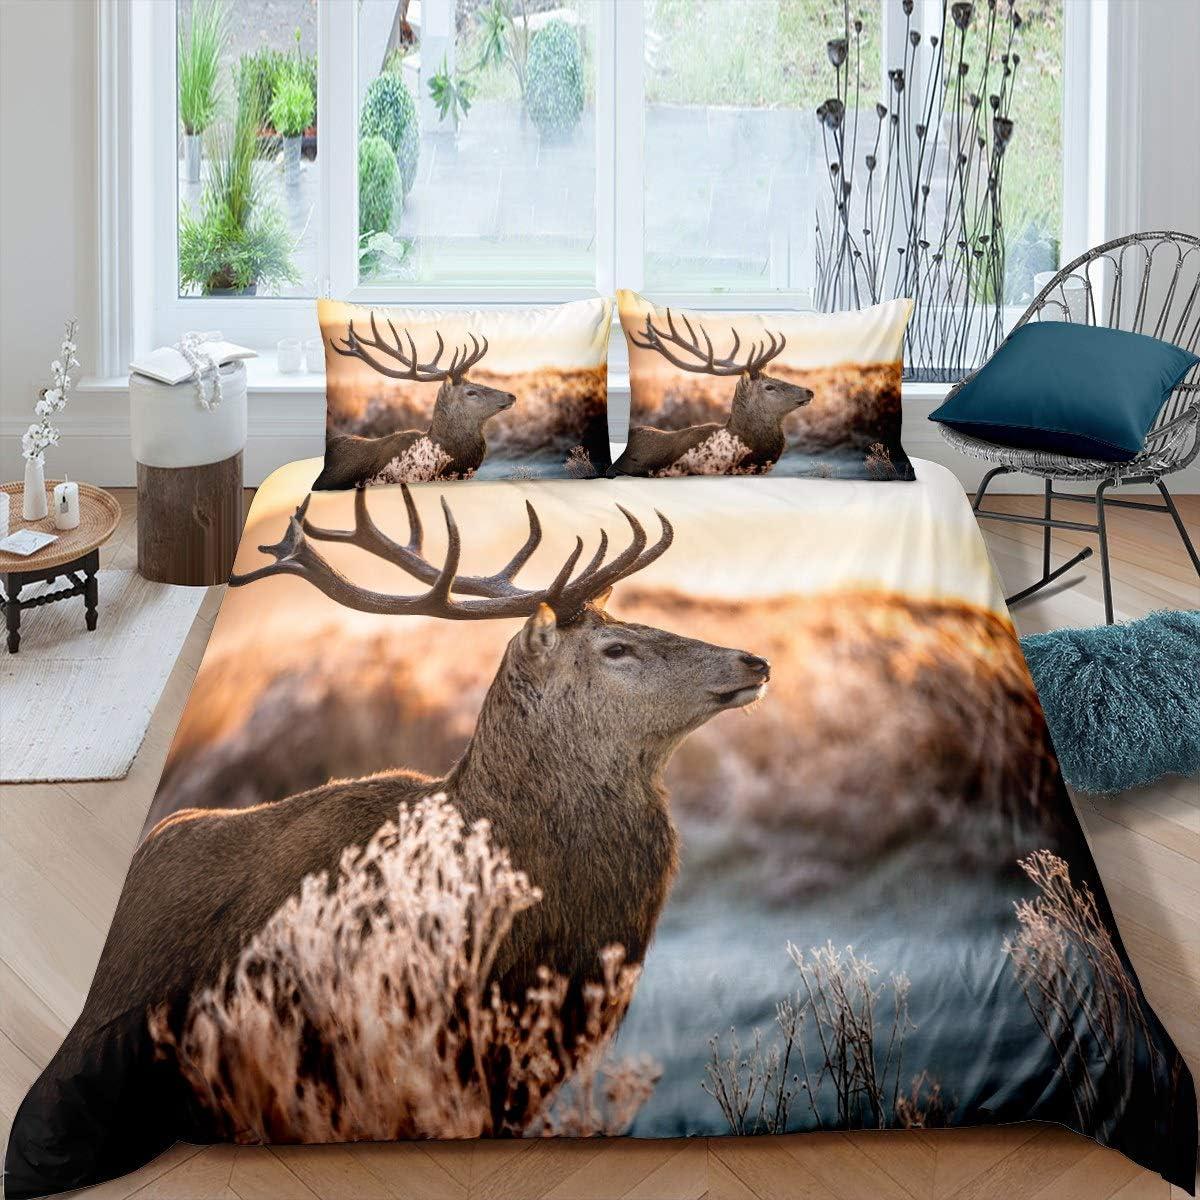 Castle Fairy 3D Elk Animals Type Microfiber Duvet Cover Twin Realistic Deer Printed Bedding Sets for Boys Girls Teen Winter Scenes 2 Pieces Comforter Sets(1 Duvet Cover 1 Pillow case)